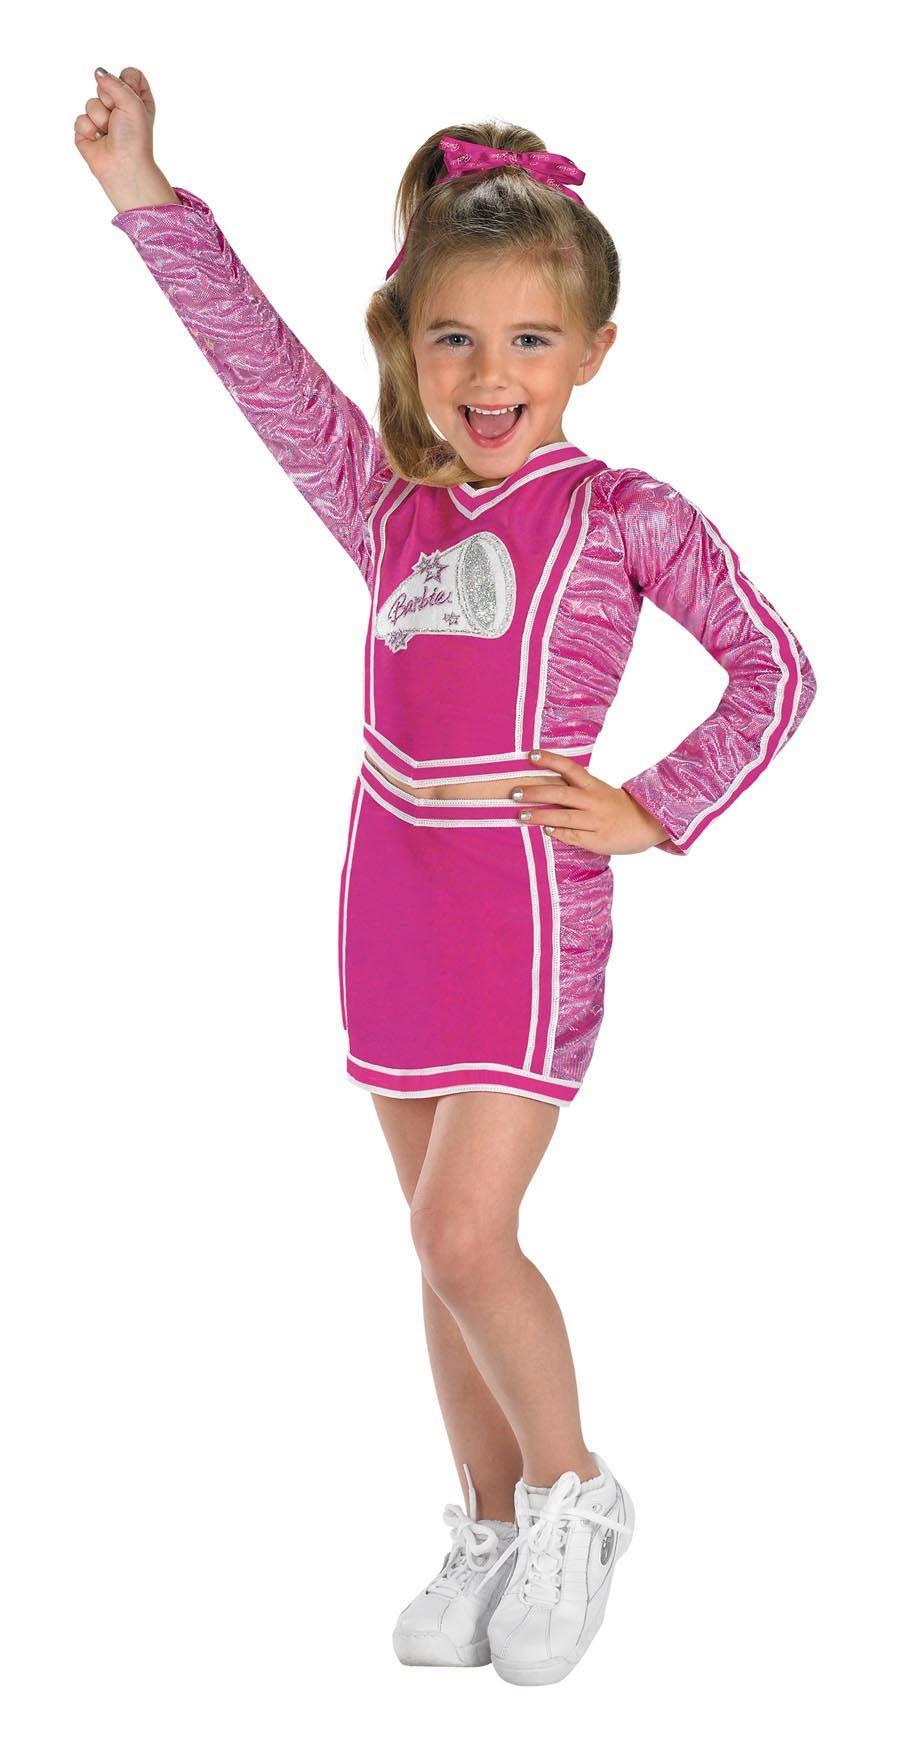 Cheerleader Costume Kids   Cheerleading Outfits For Kids ...